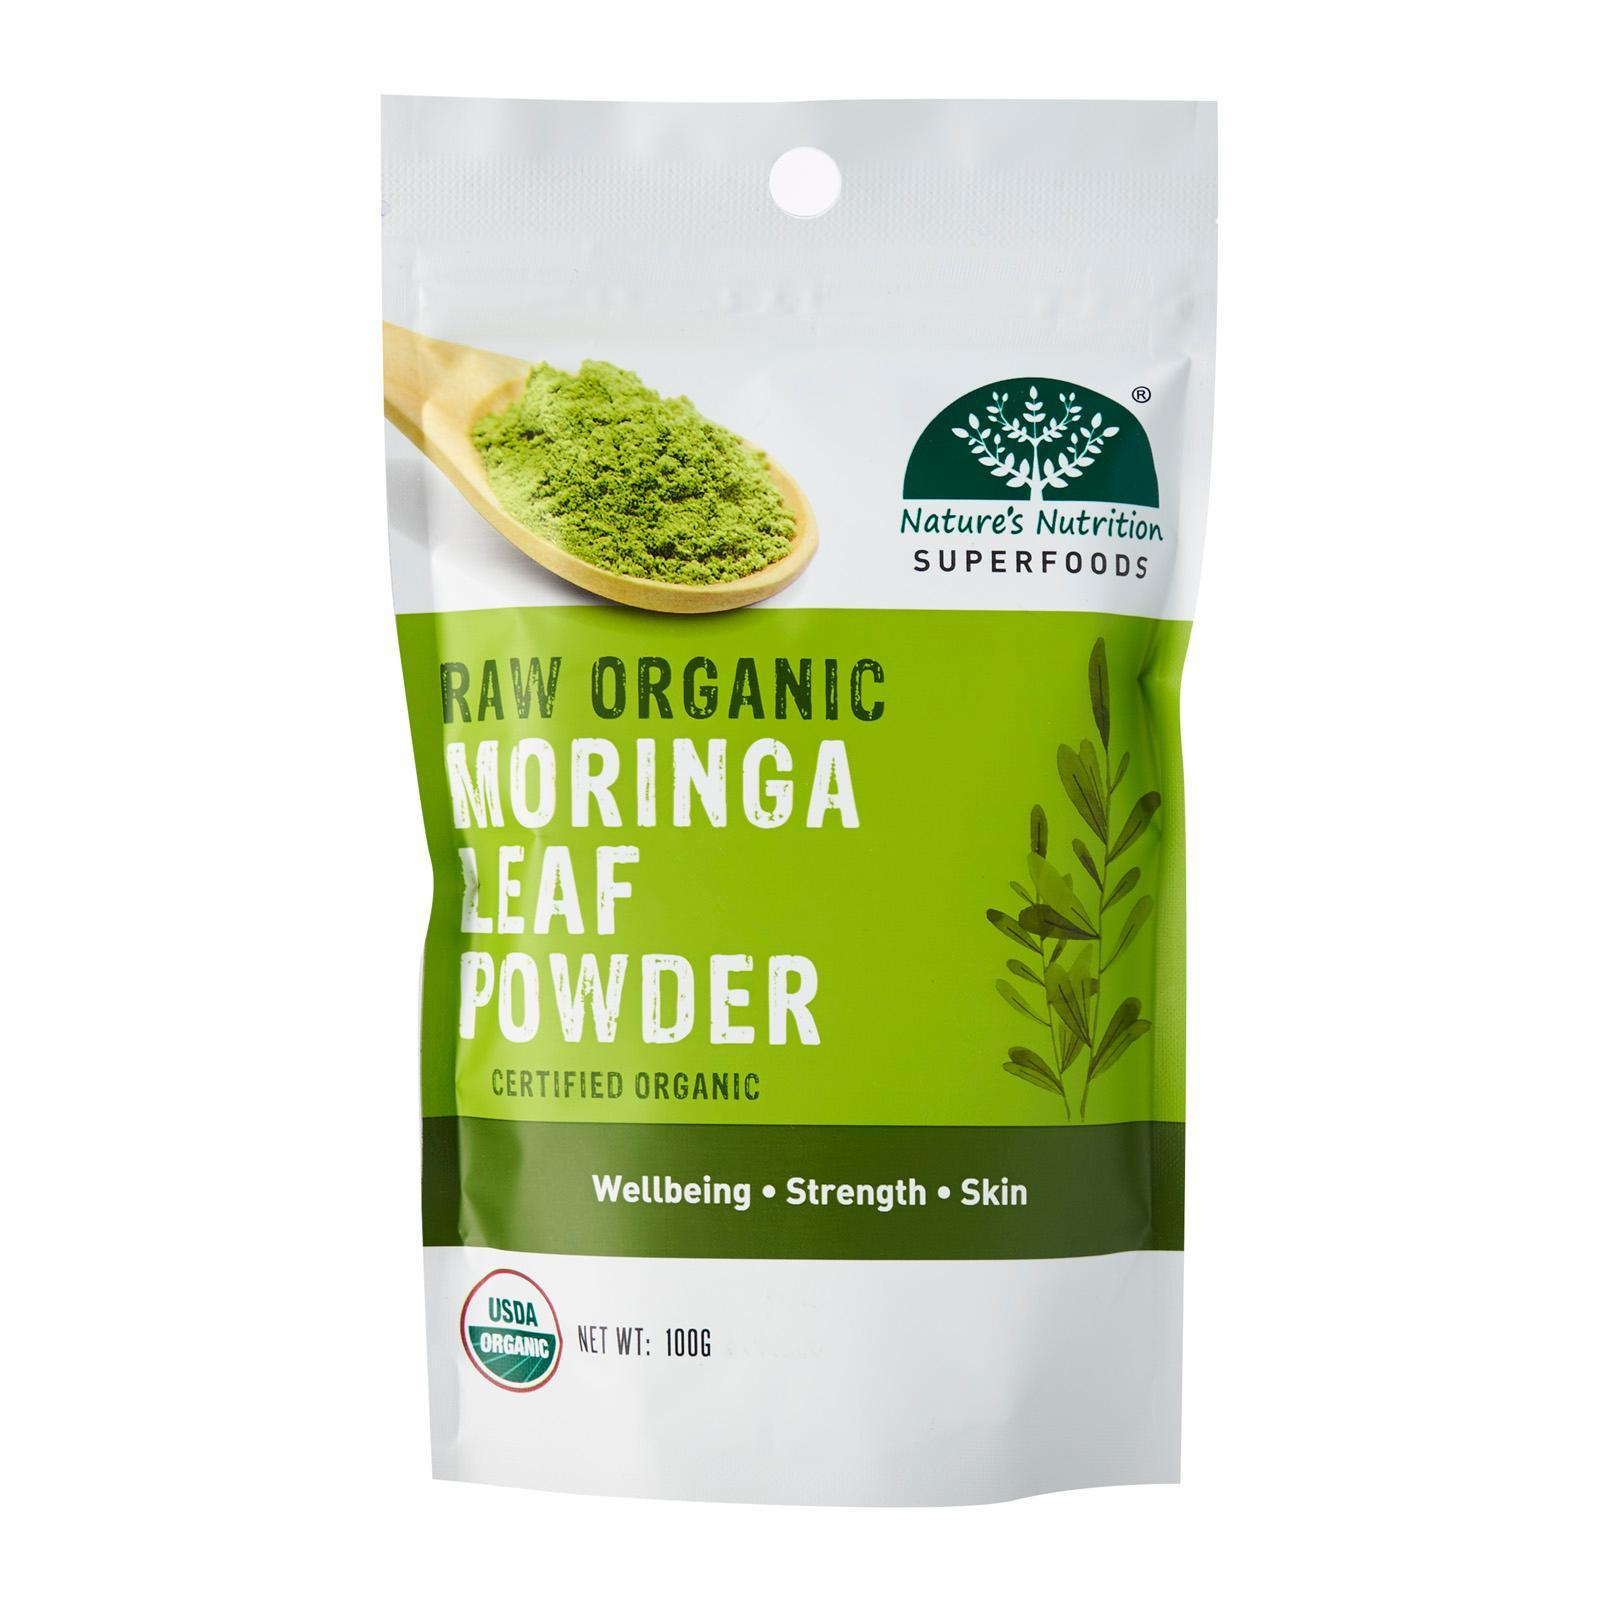 Nature's Nutrition Raw Organic Moringa Leaf Powder